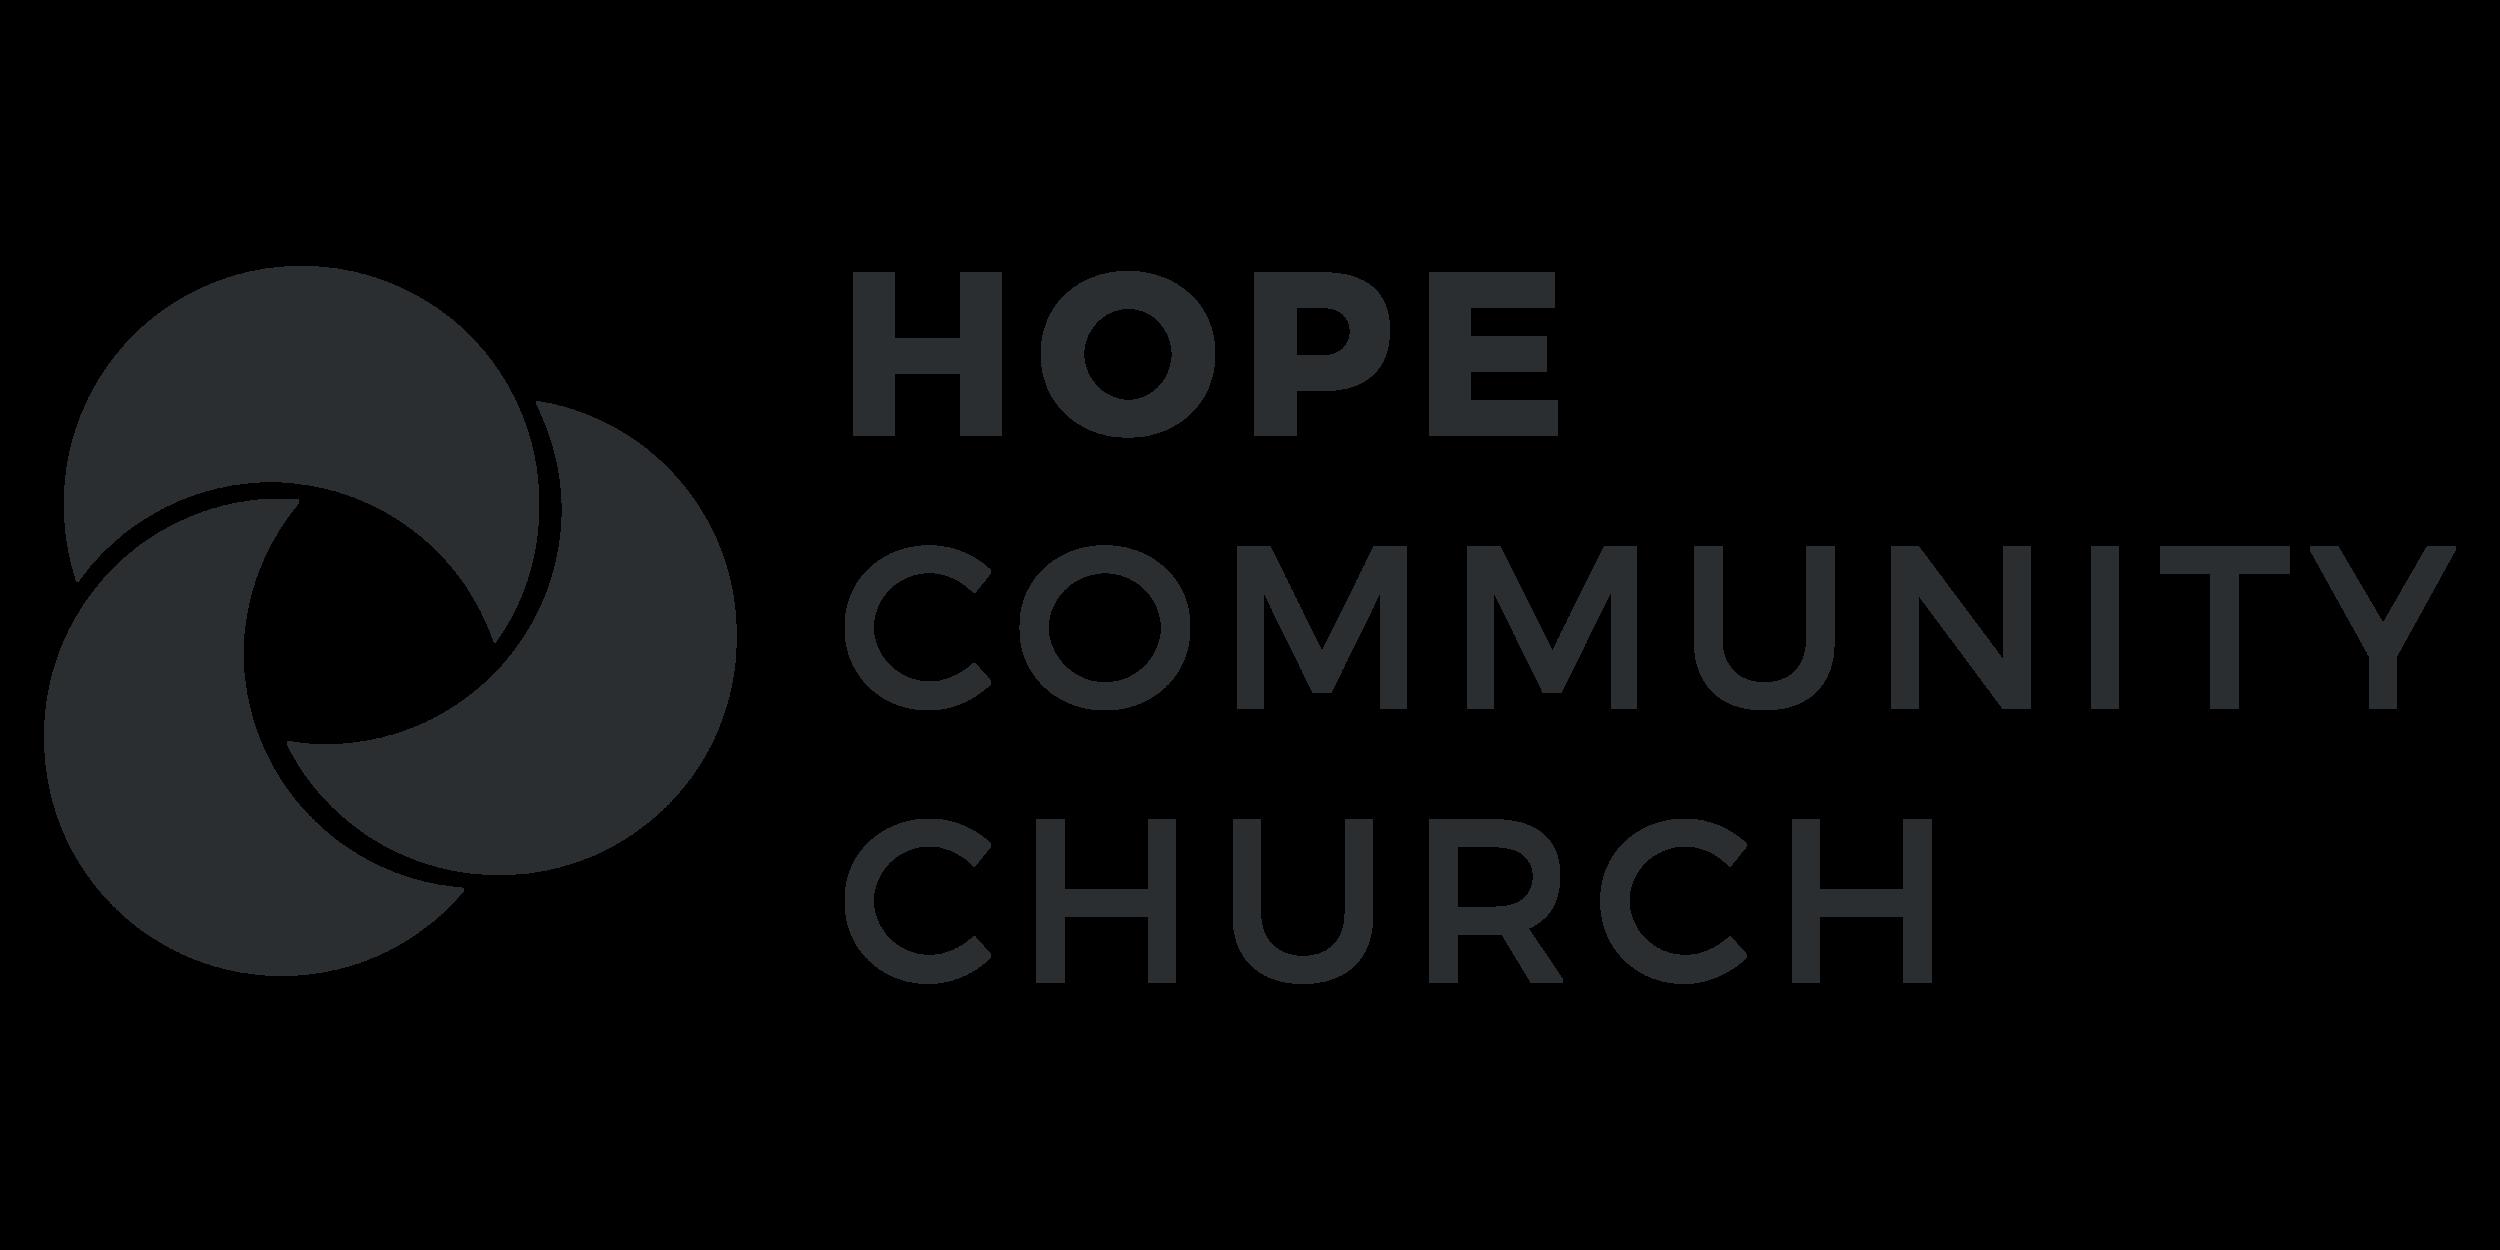 Hope Community Church's logo - a church based in the centre of Basingstoke